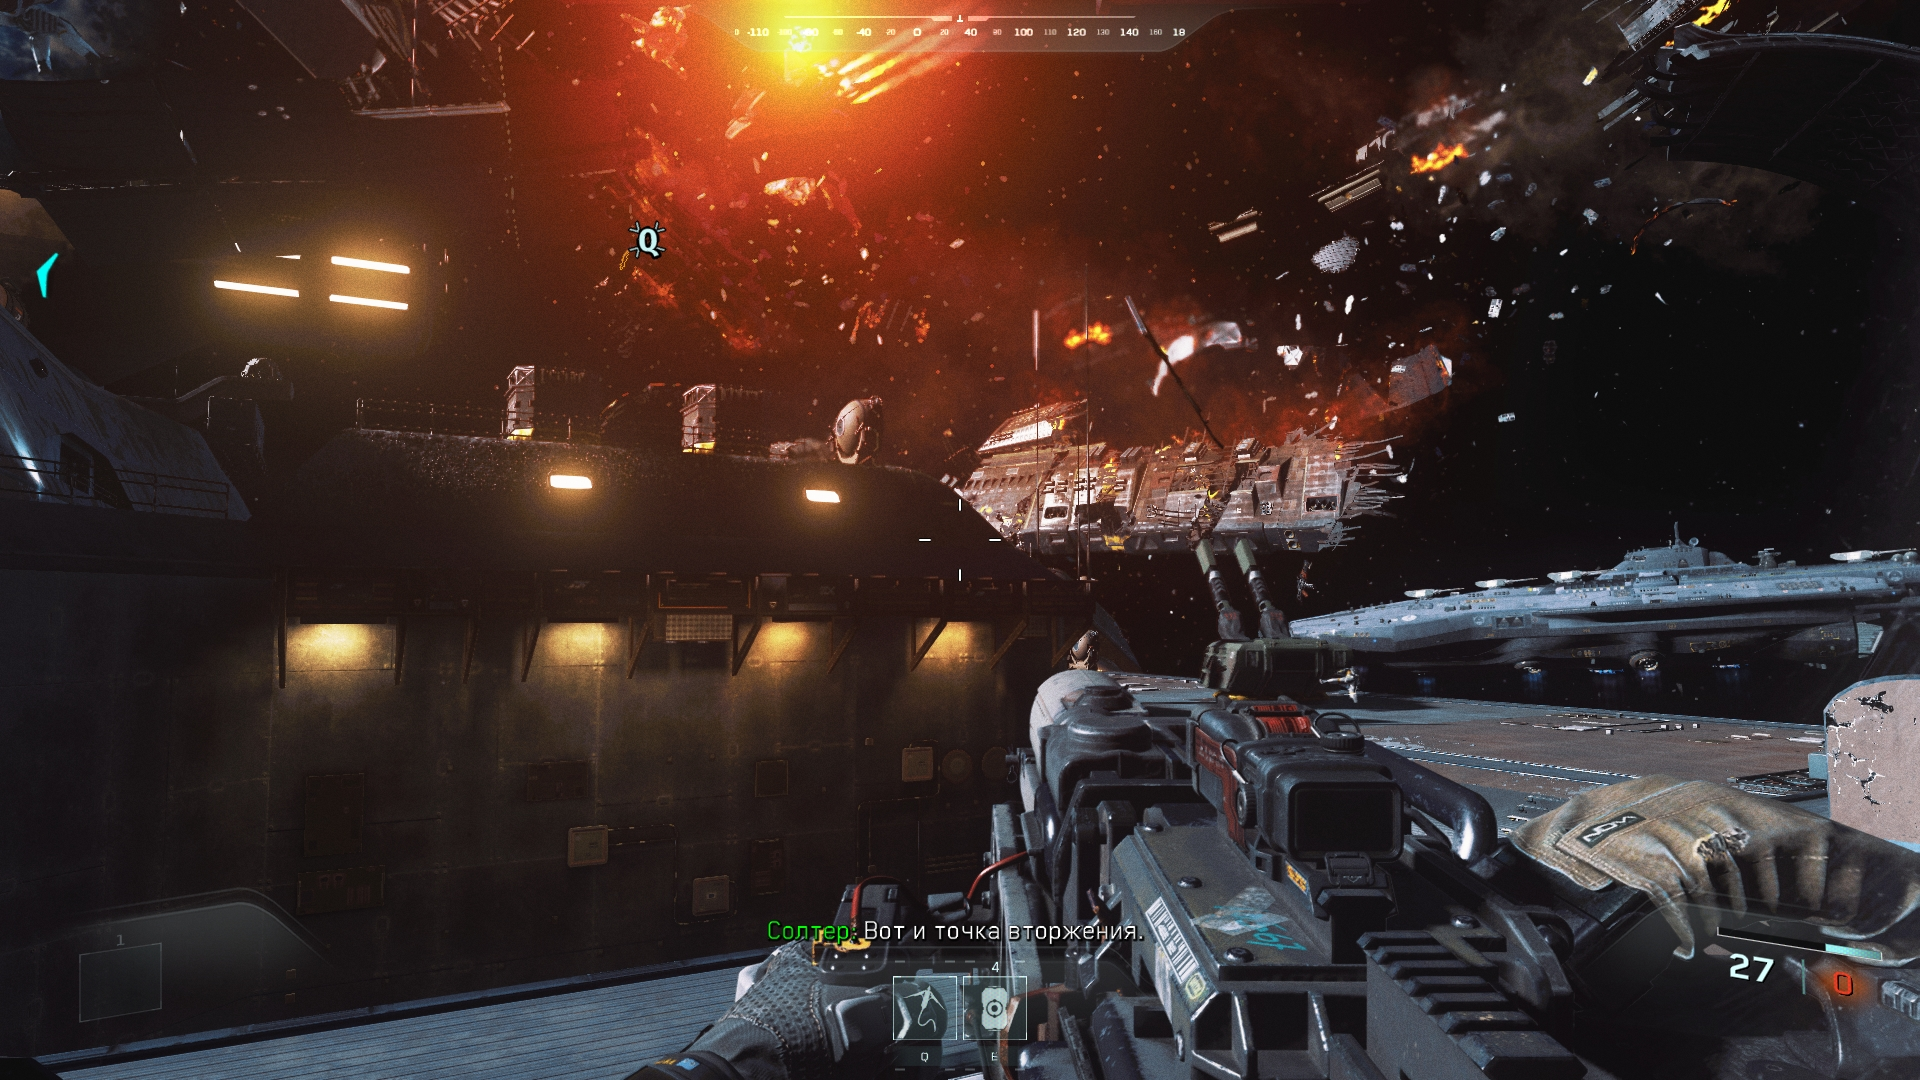 00043.Jpg - Call of Duty: Infinite Warfare